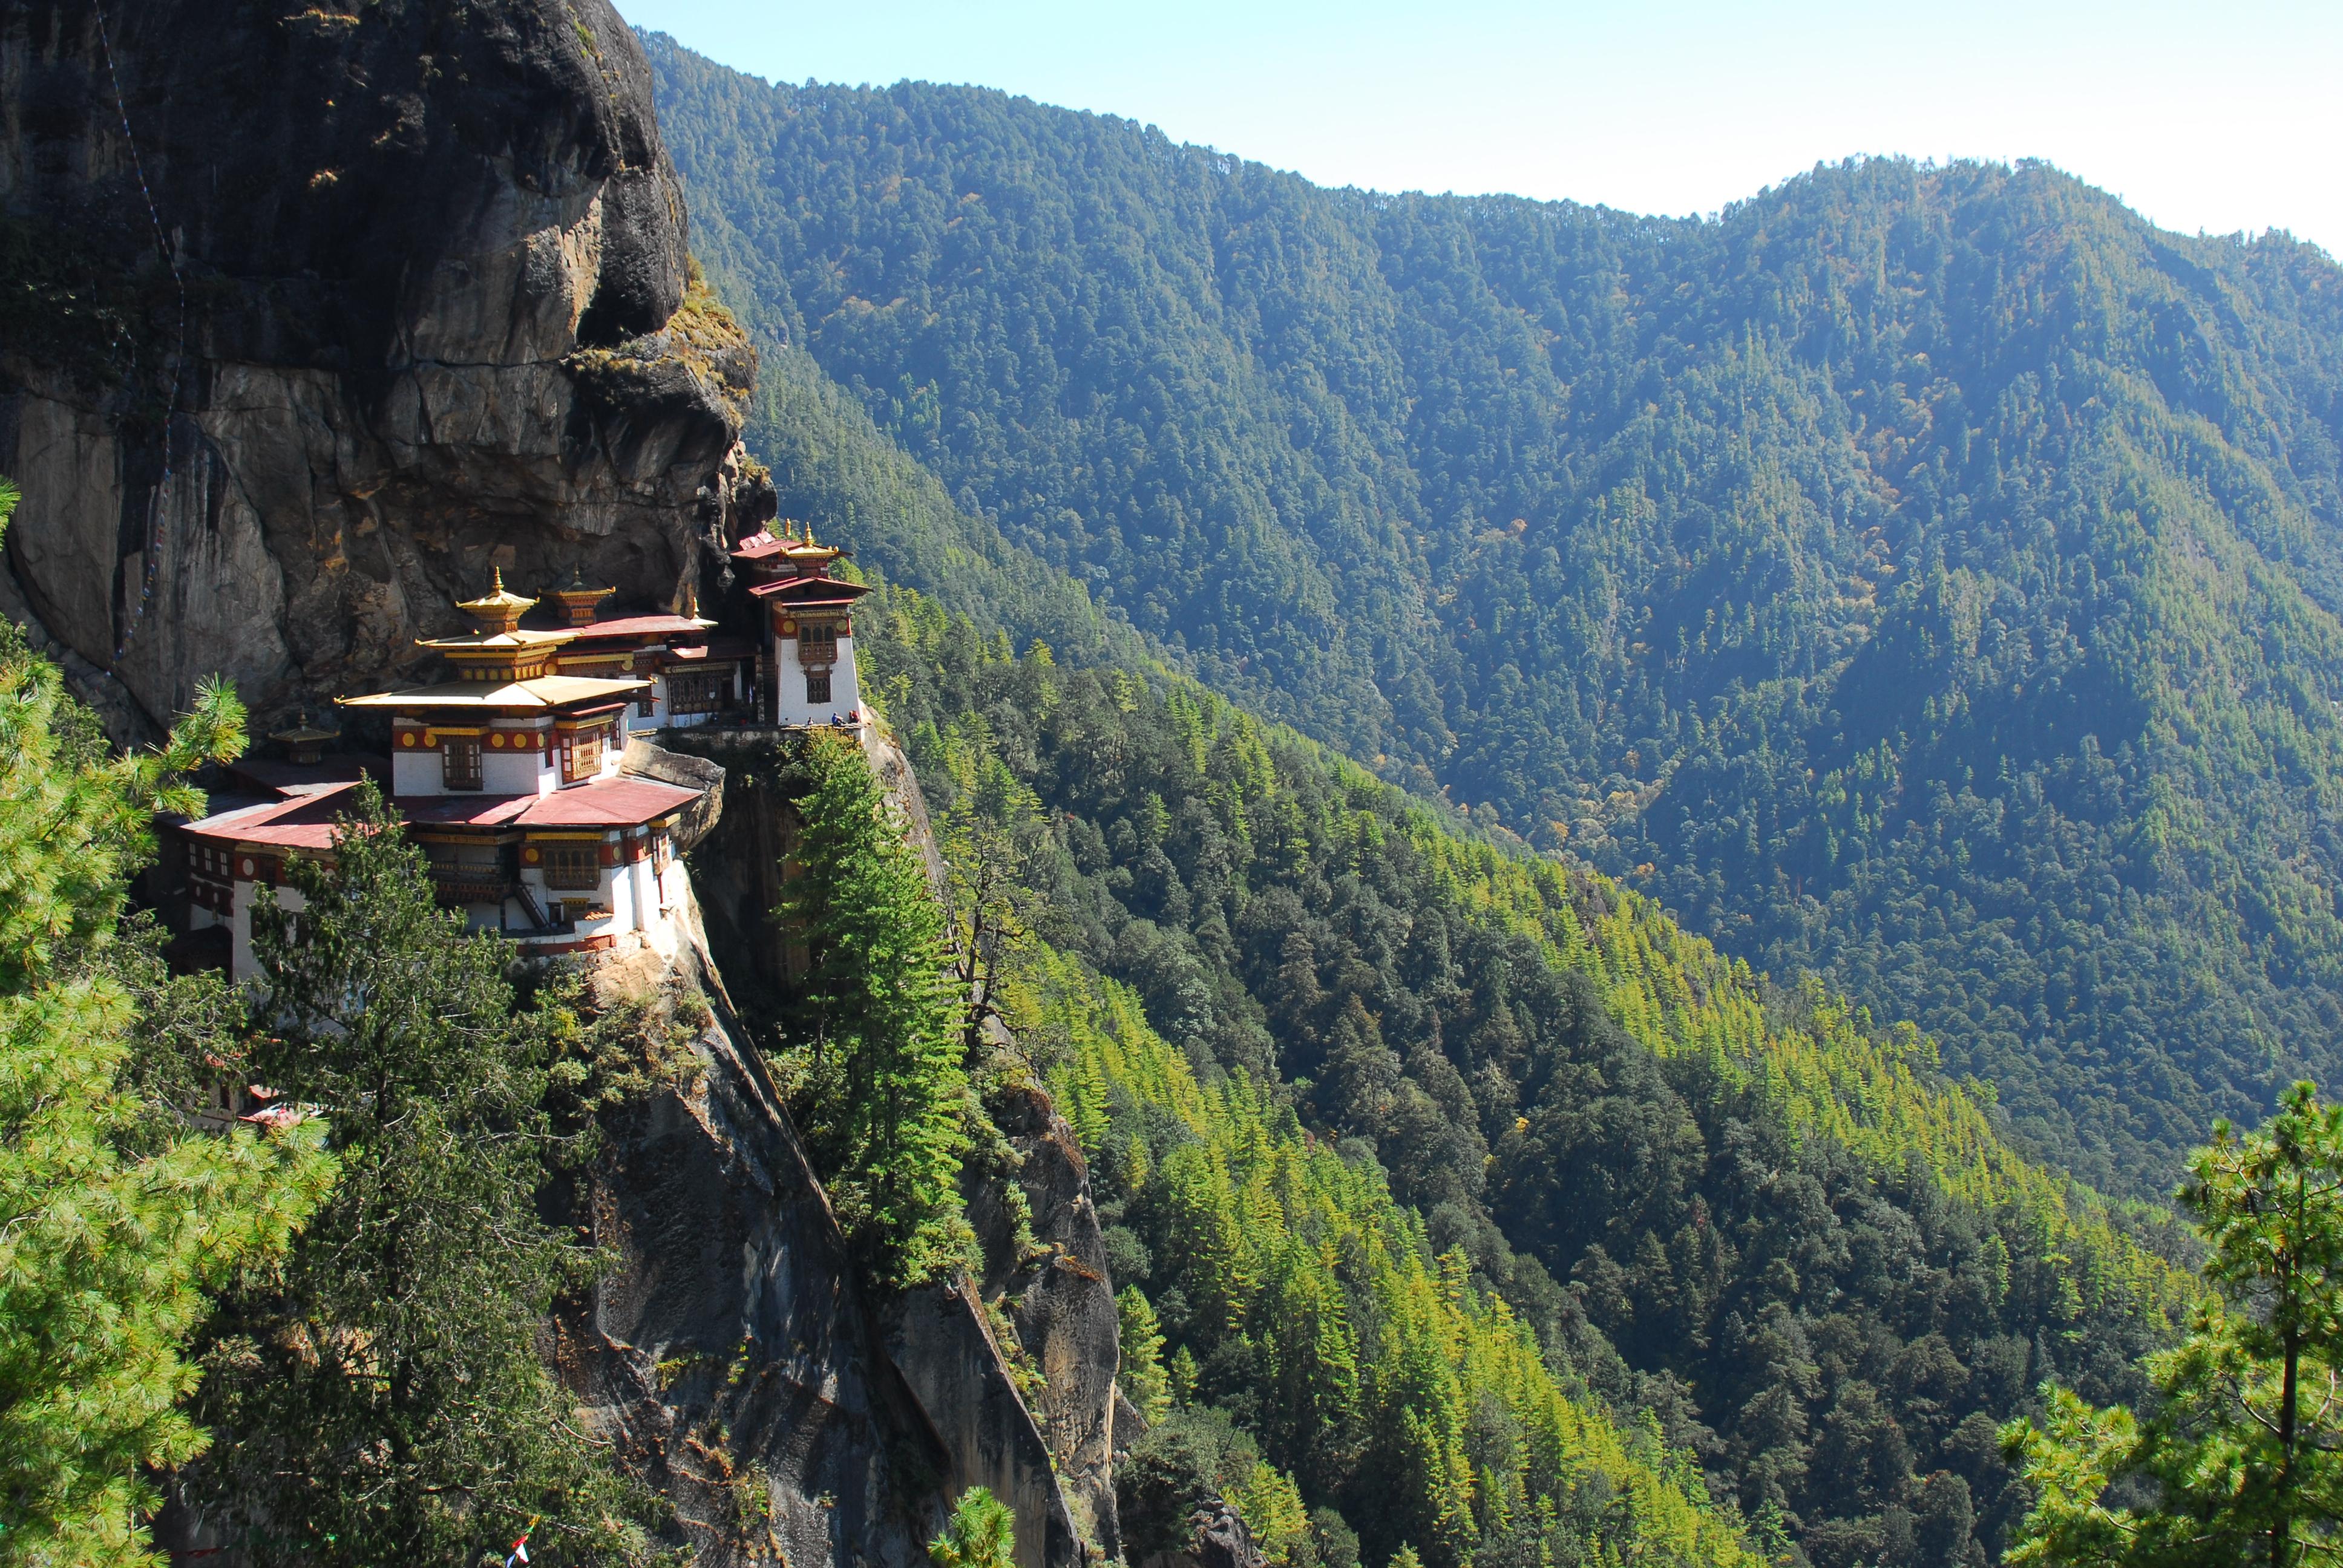 taktsang-above-paro-valley-bhutan-1.jpg